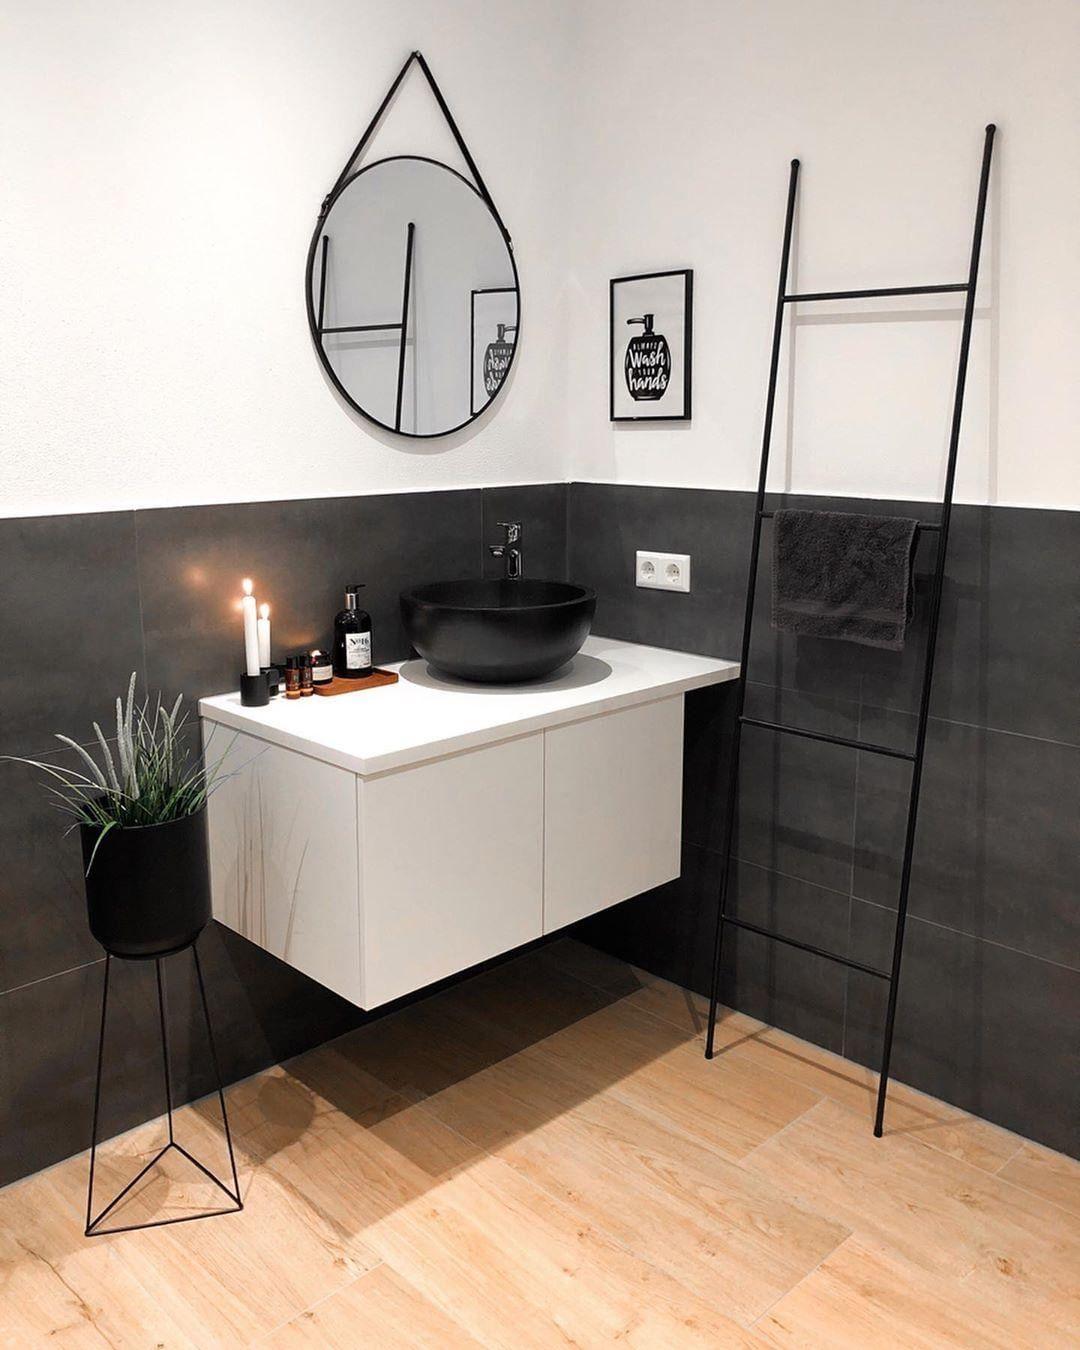 Bathroom featuring black-and-white furni...